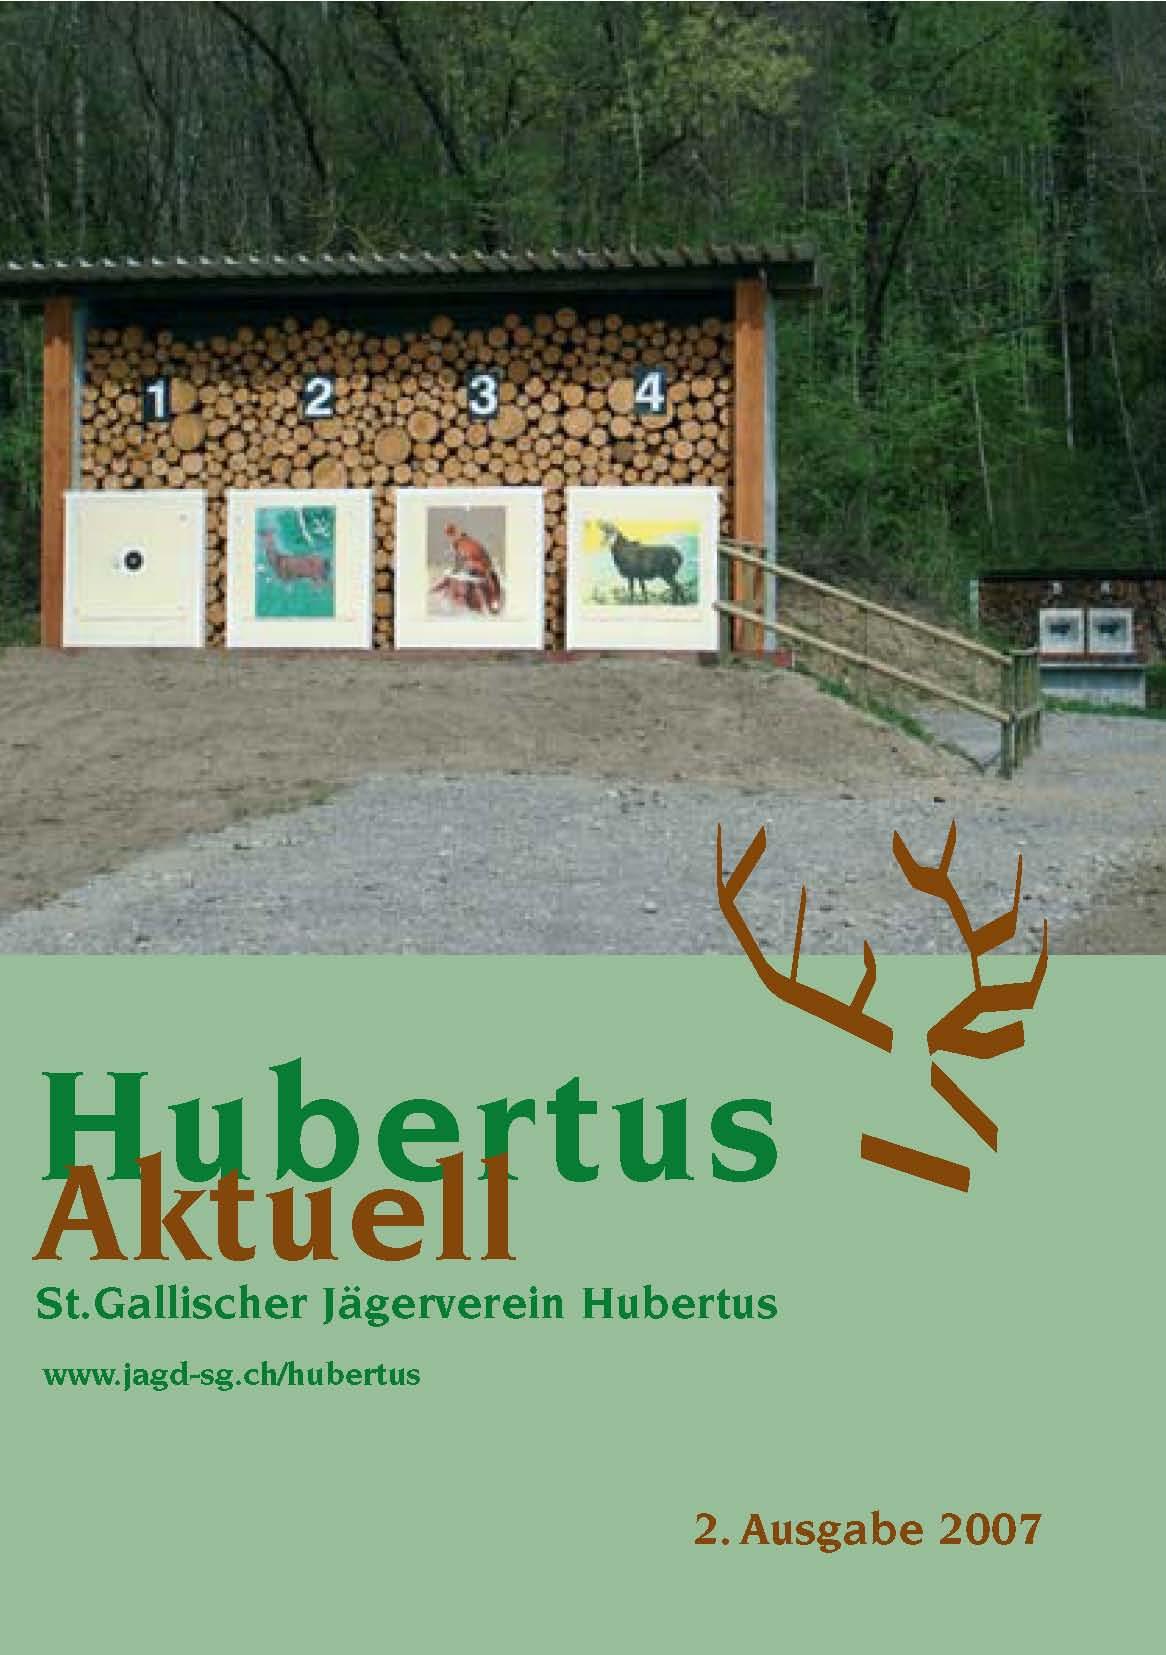 hubertus akutell 02 2007